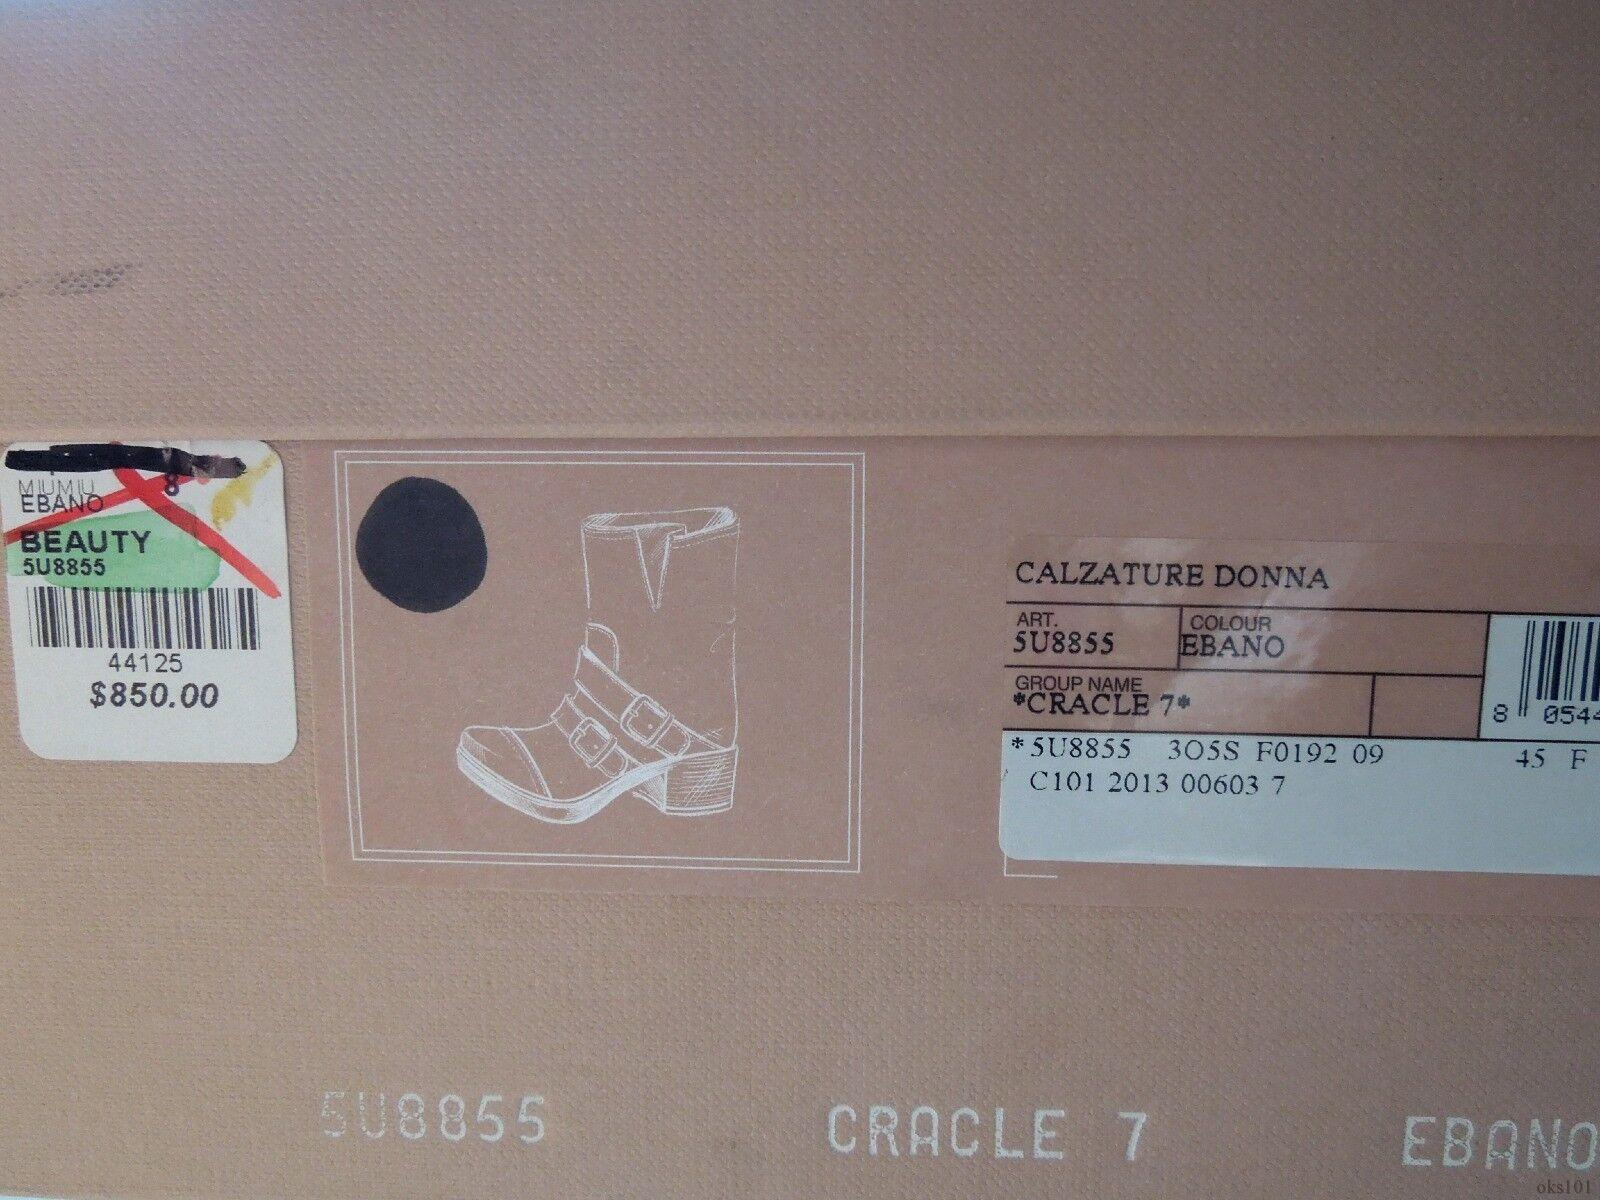 new $850 'Beauty' MIU MIU PRADA 'Beauty' $850 crackled schwarz leather buckled ANKLE Stiefel - HOT 8ba5e2